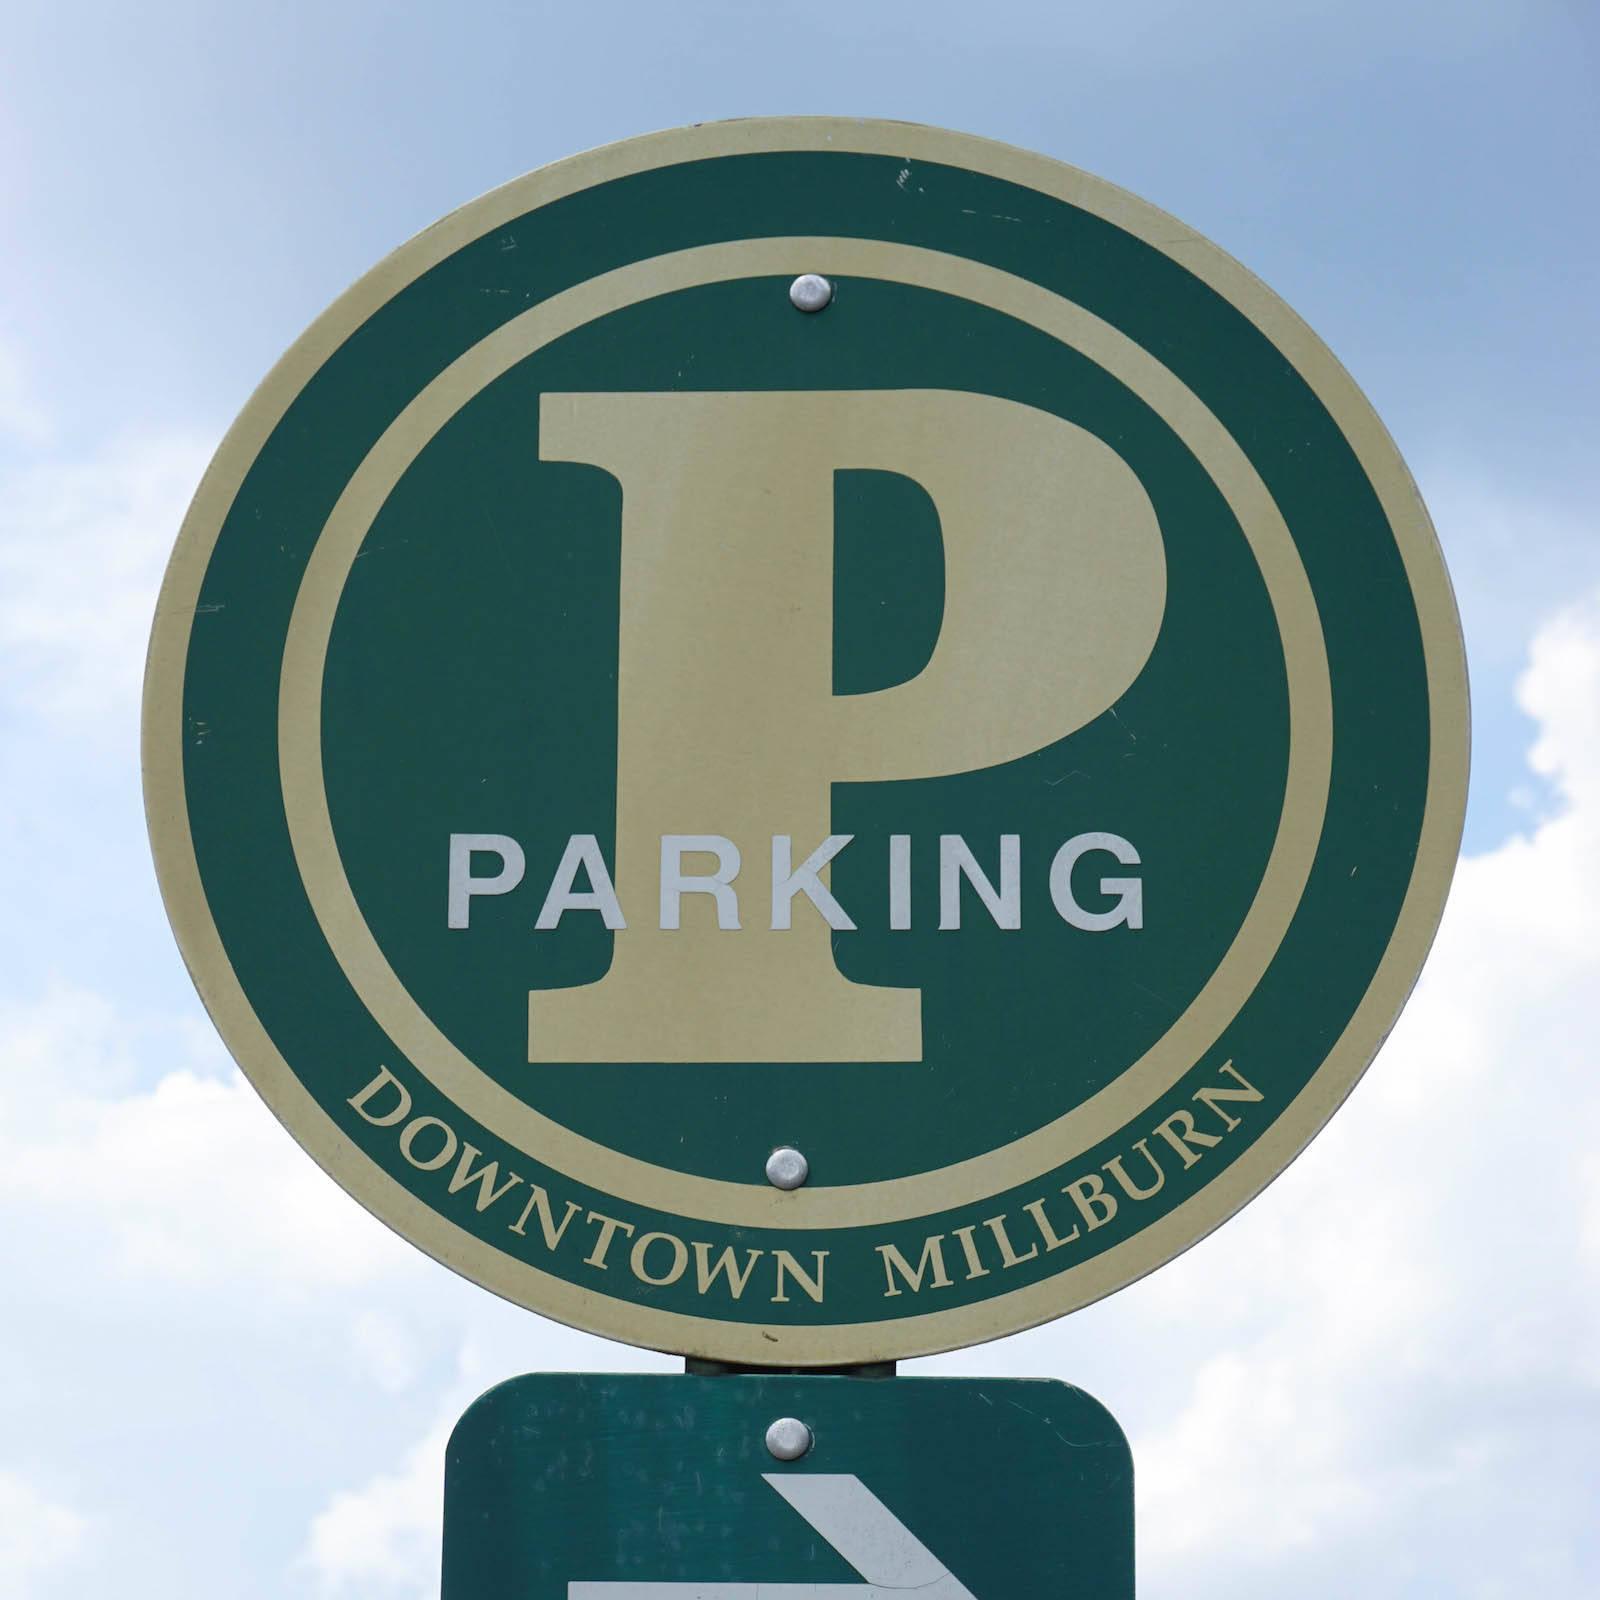 bf3675f58fa30644734d_ec9c78d0fa8836db78ee_parking_sign-1.jpeg